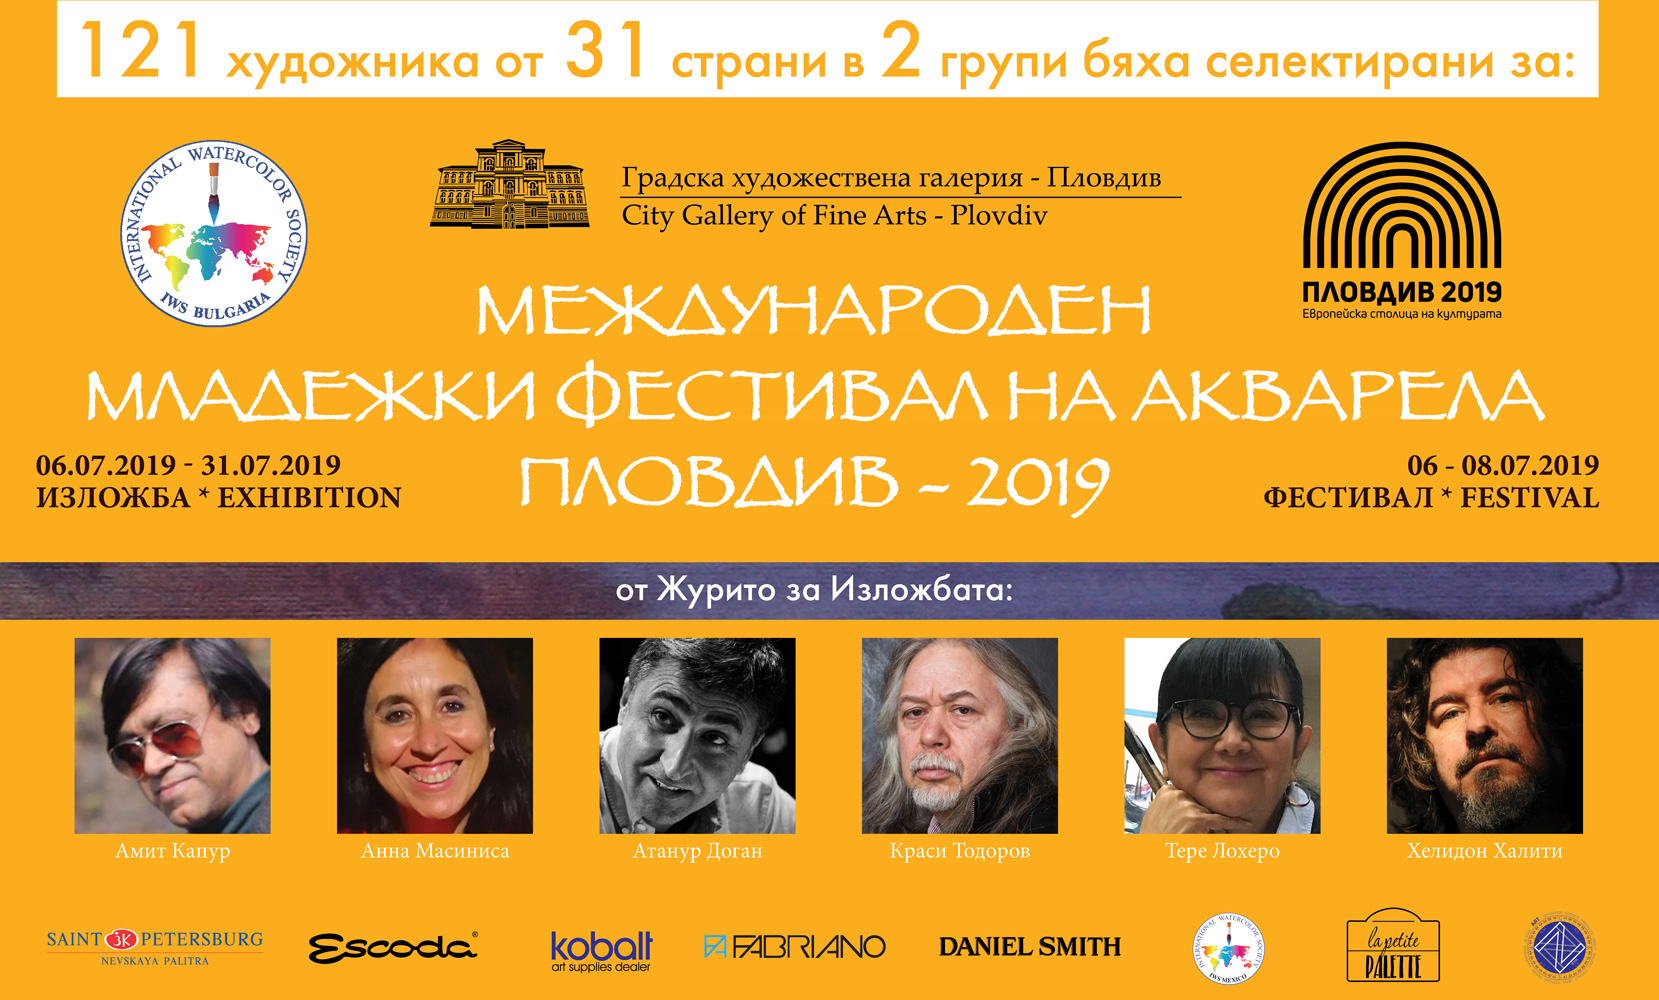 Европейска столица на културата домакин на международен фестивал на акварела